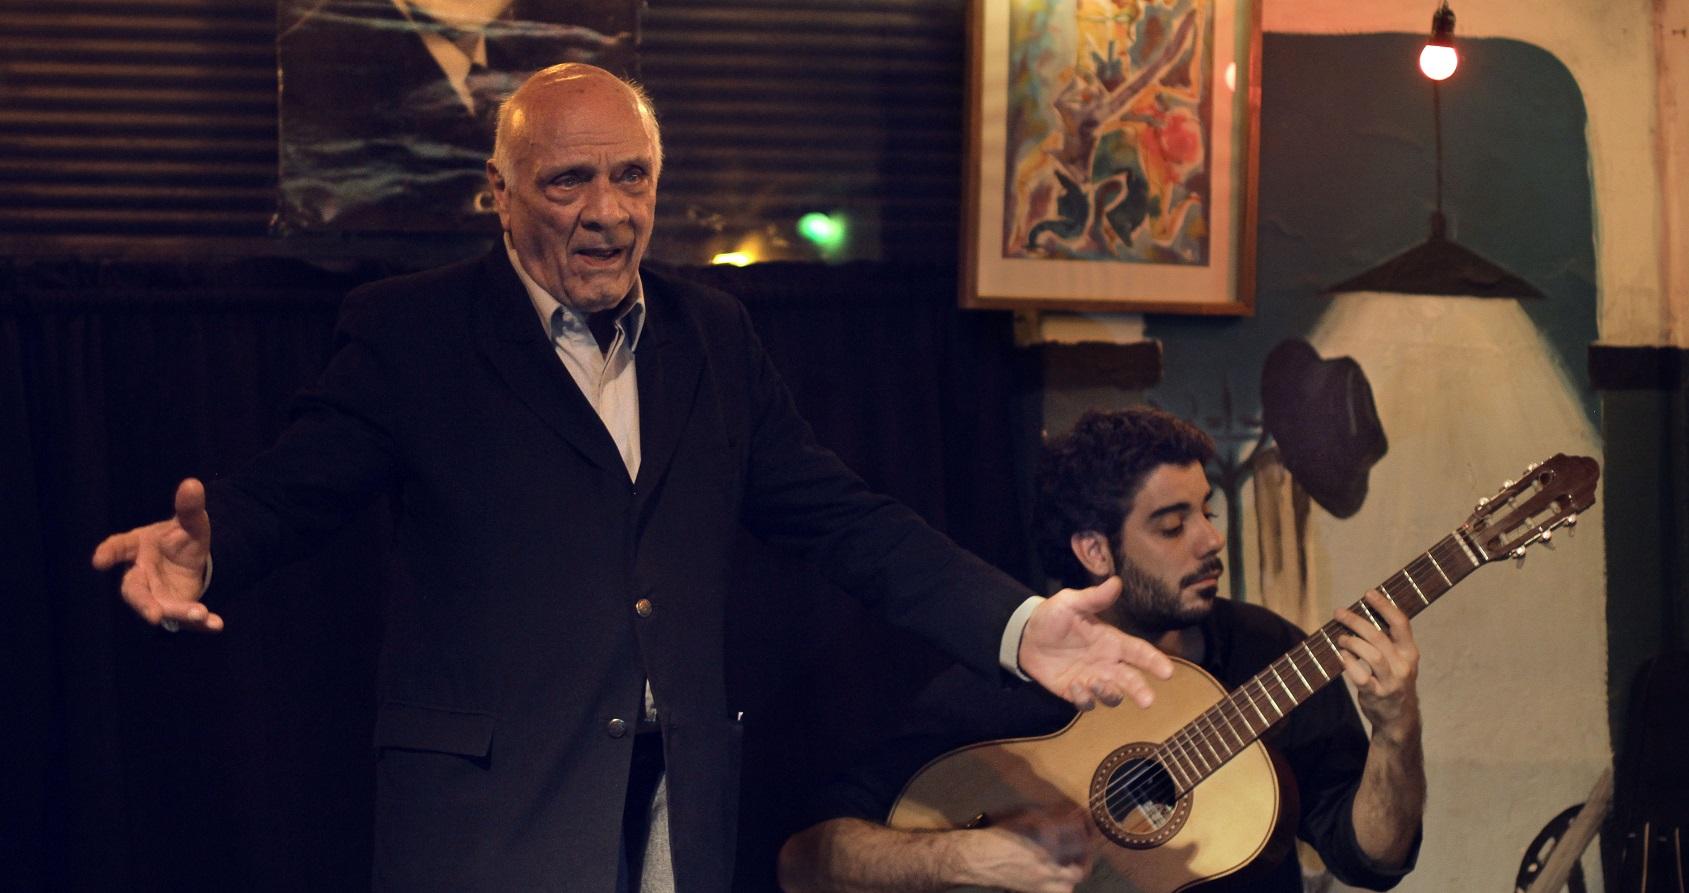 foot-tango-osvaldo-peredo-ulyces-02